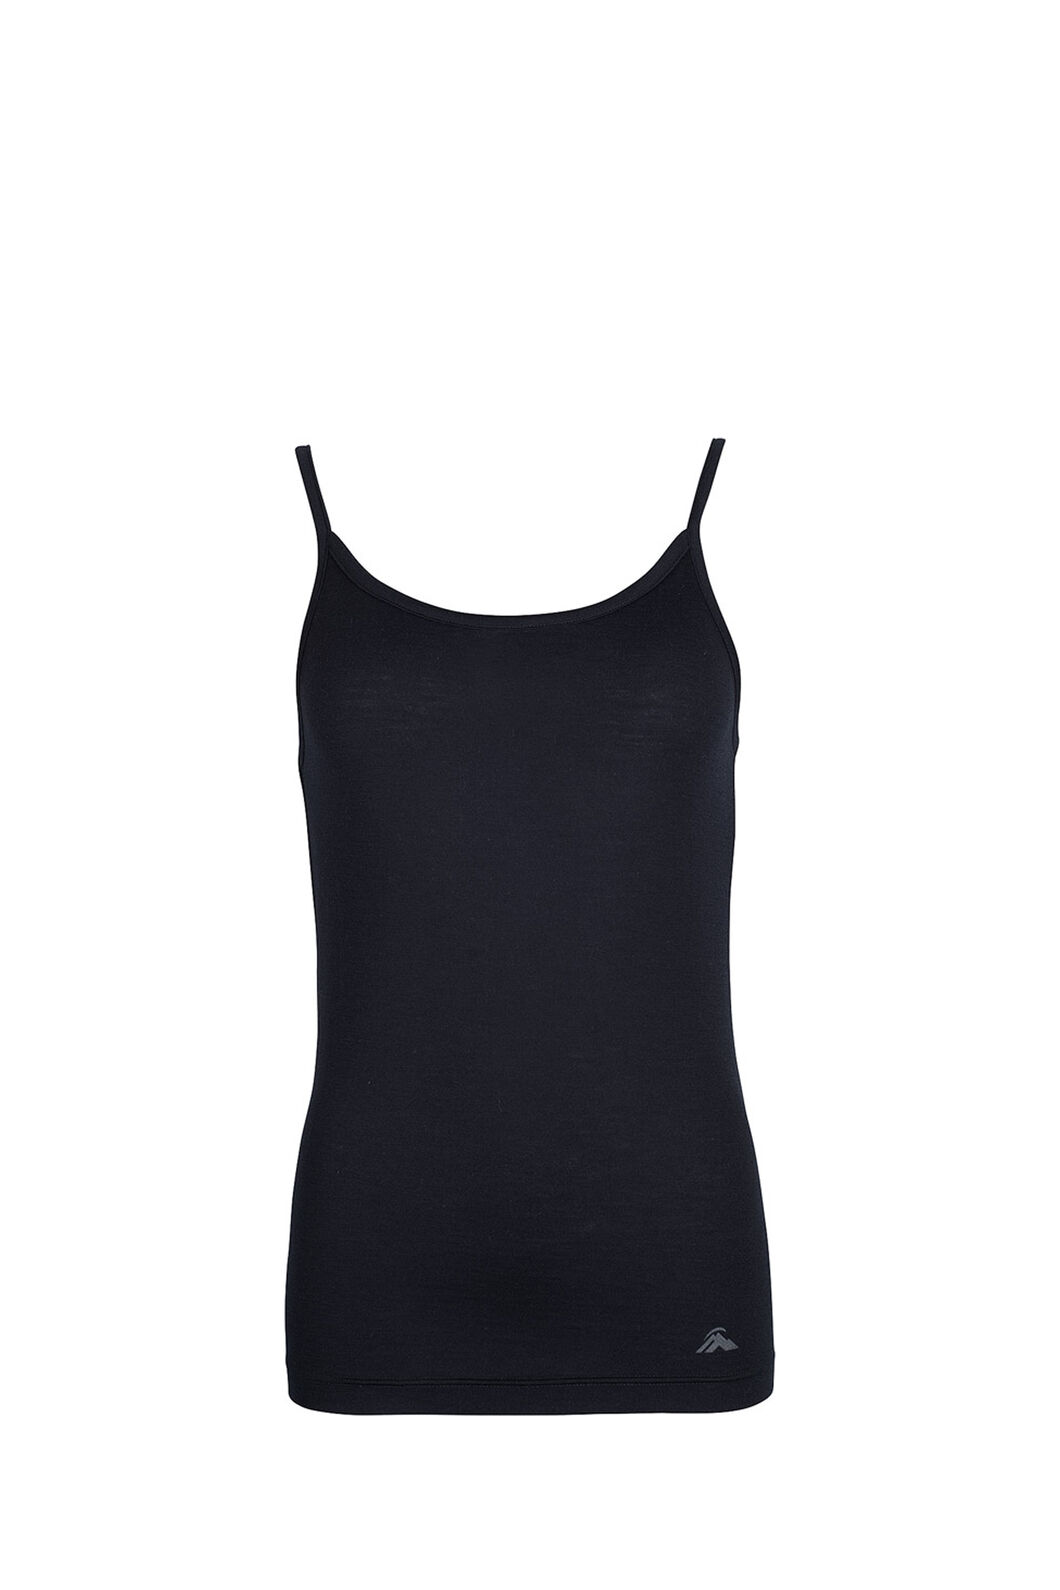 Macpac 150 Merino Camisole - Women's, Black, hi-res